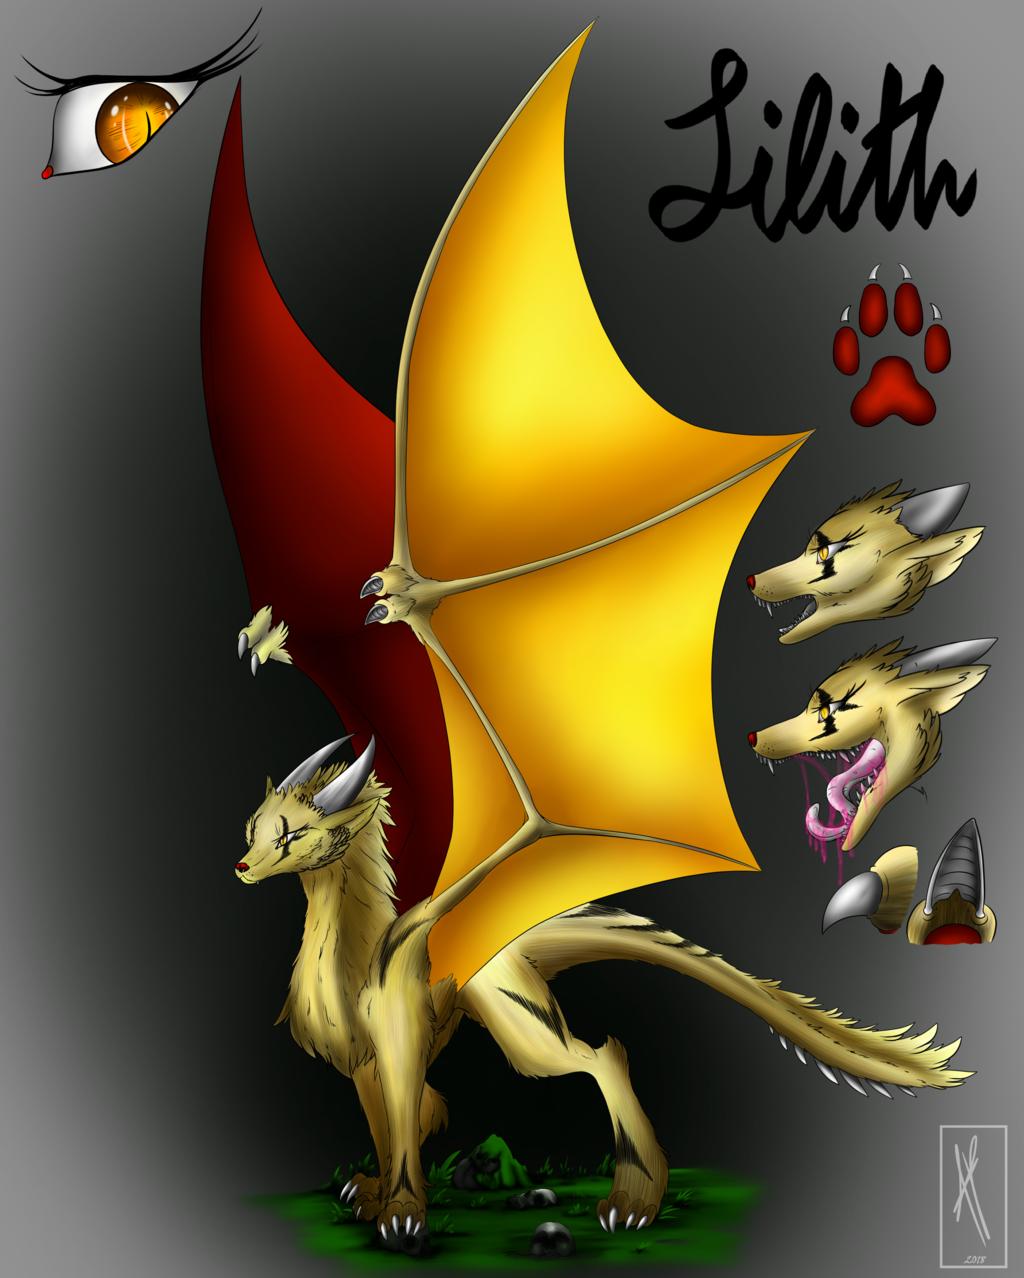 Lilith Character Sheet - Roleplay Original Charact